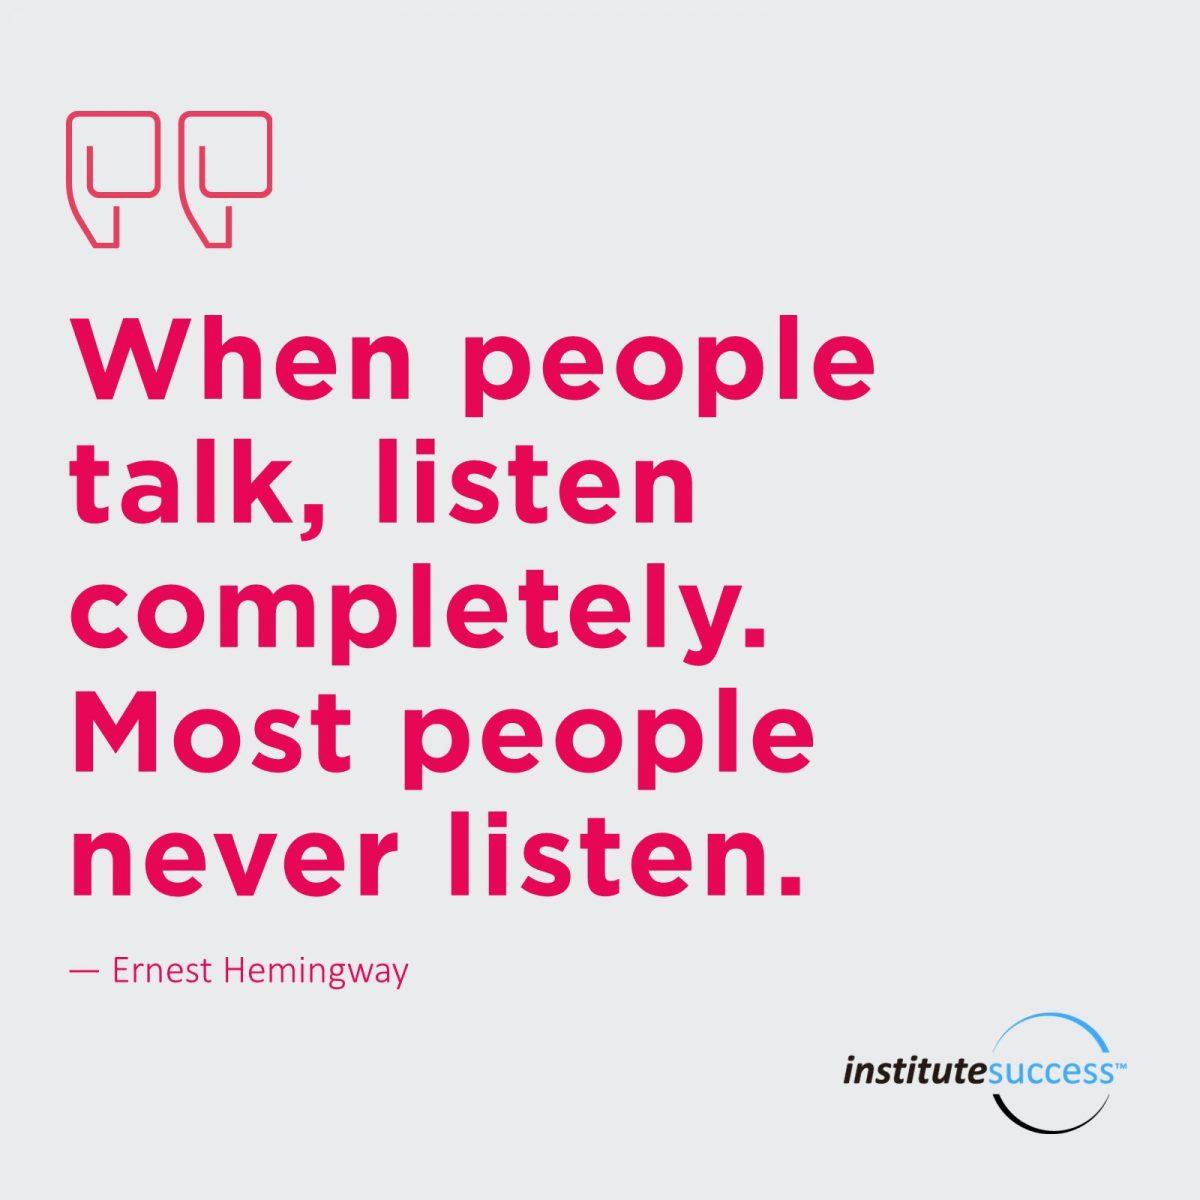 When people talk, listen completely. Most people never listen. – Ernest Hemingway